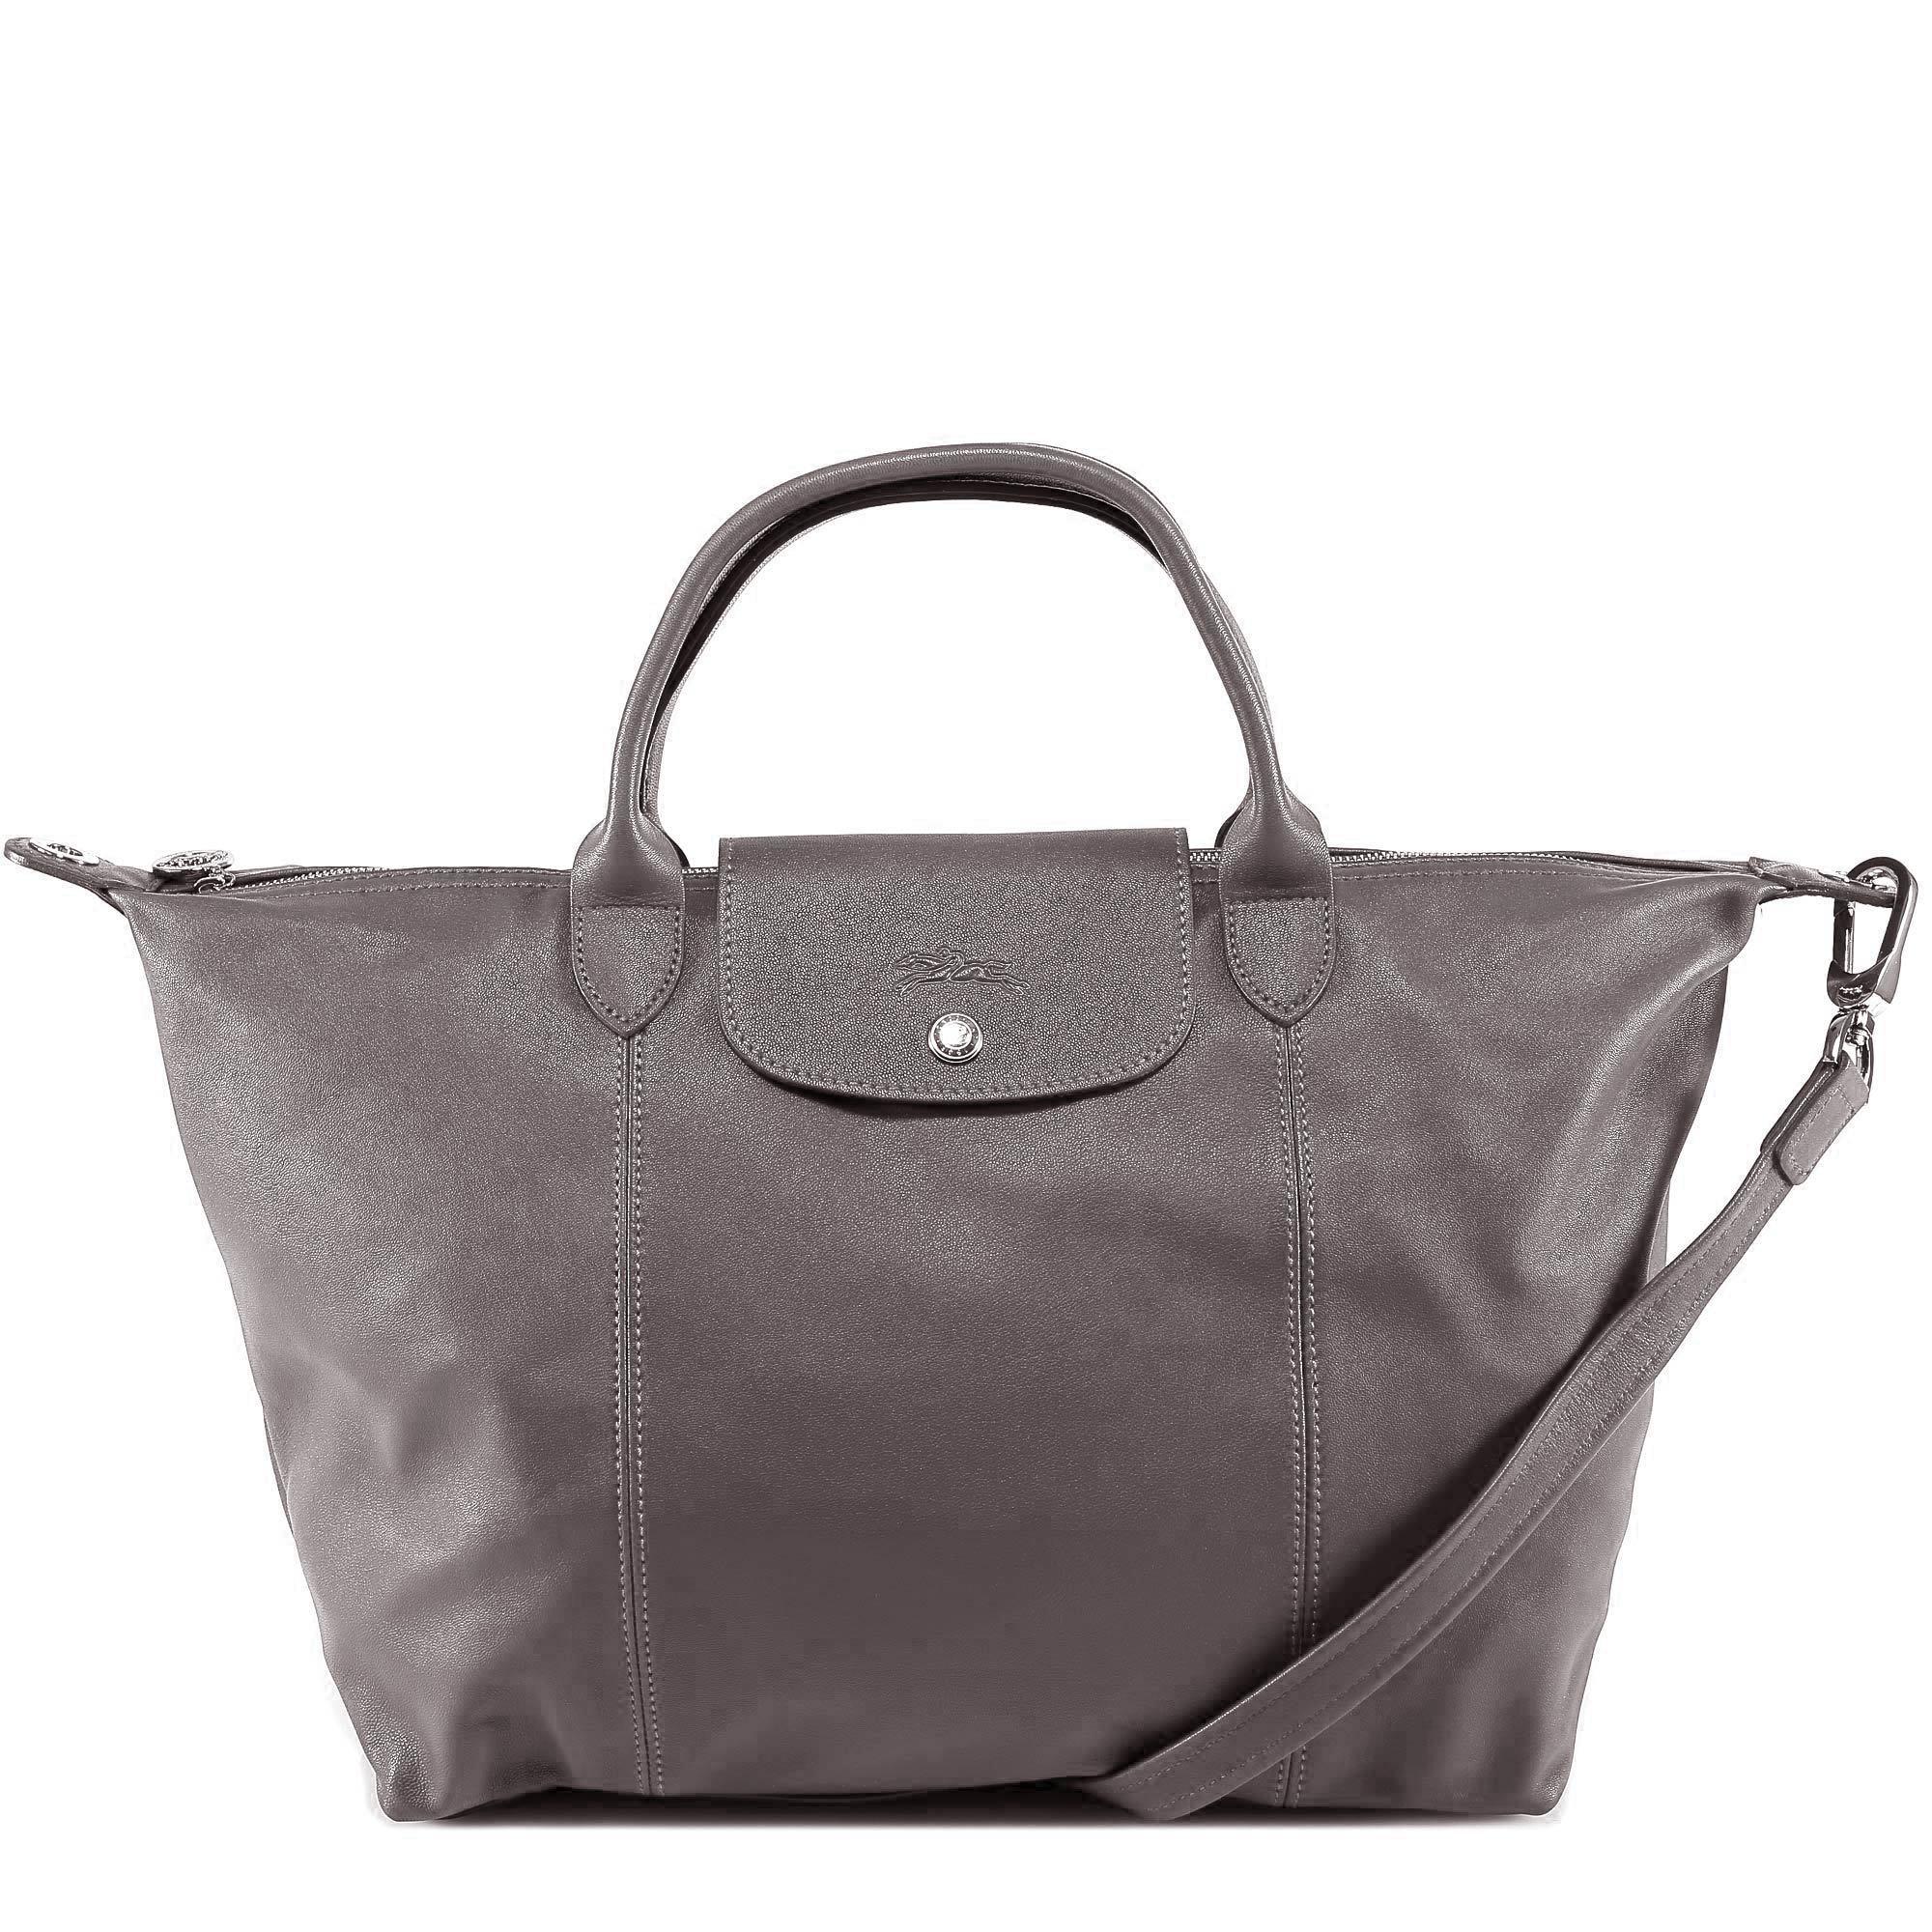 Longchamp Le Pliage Cuir Top Handle Bag in Gray - Lyst 31c964adbda9a